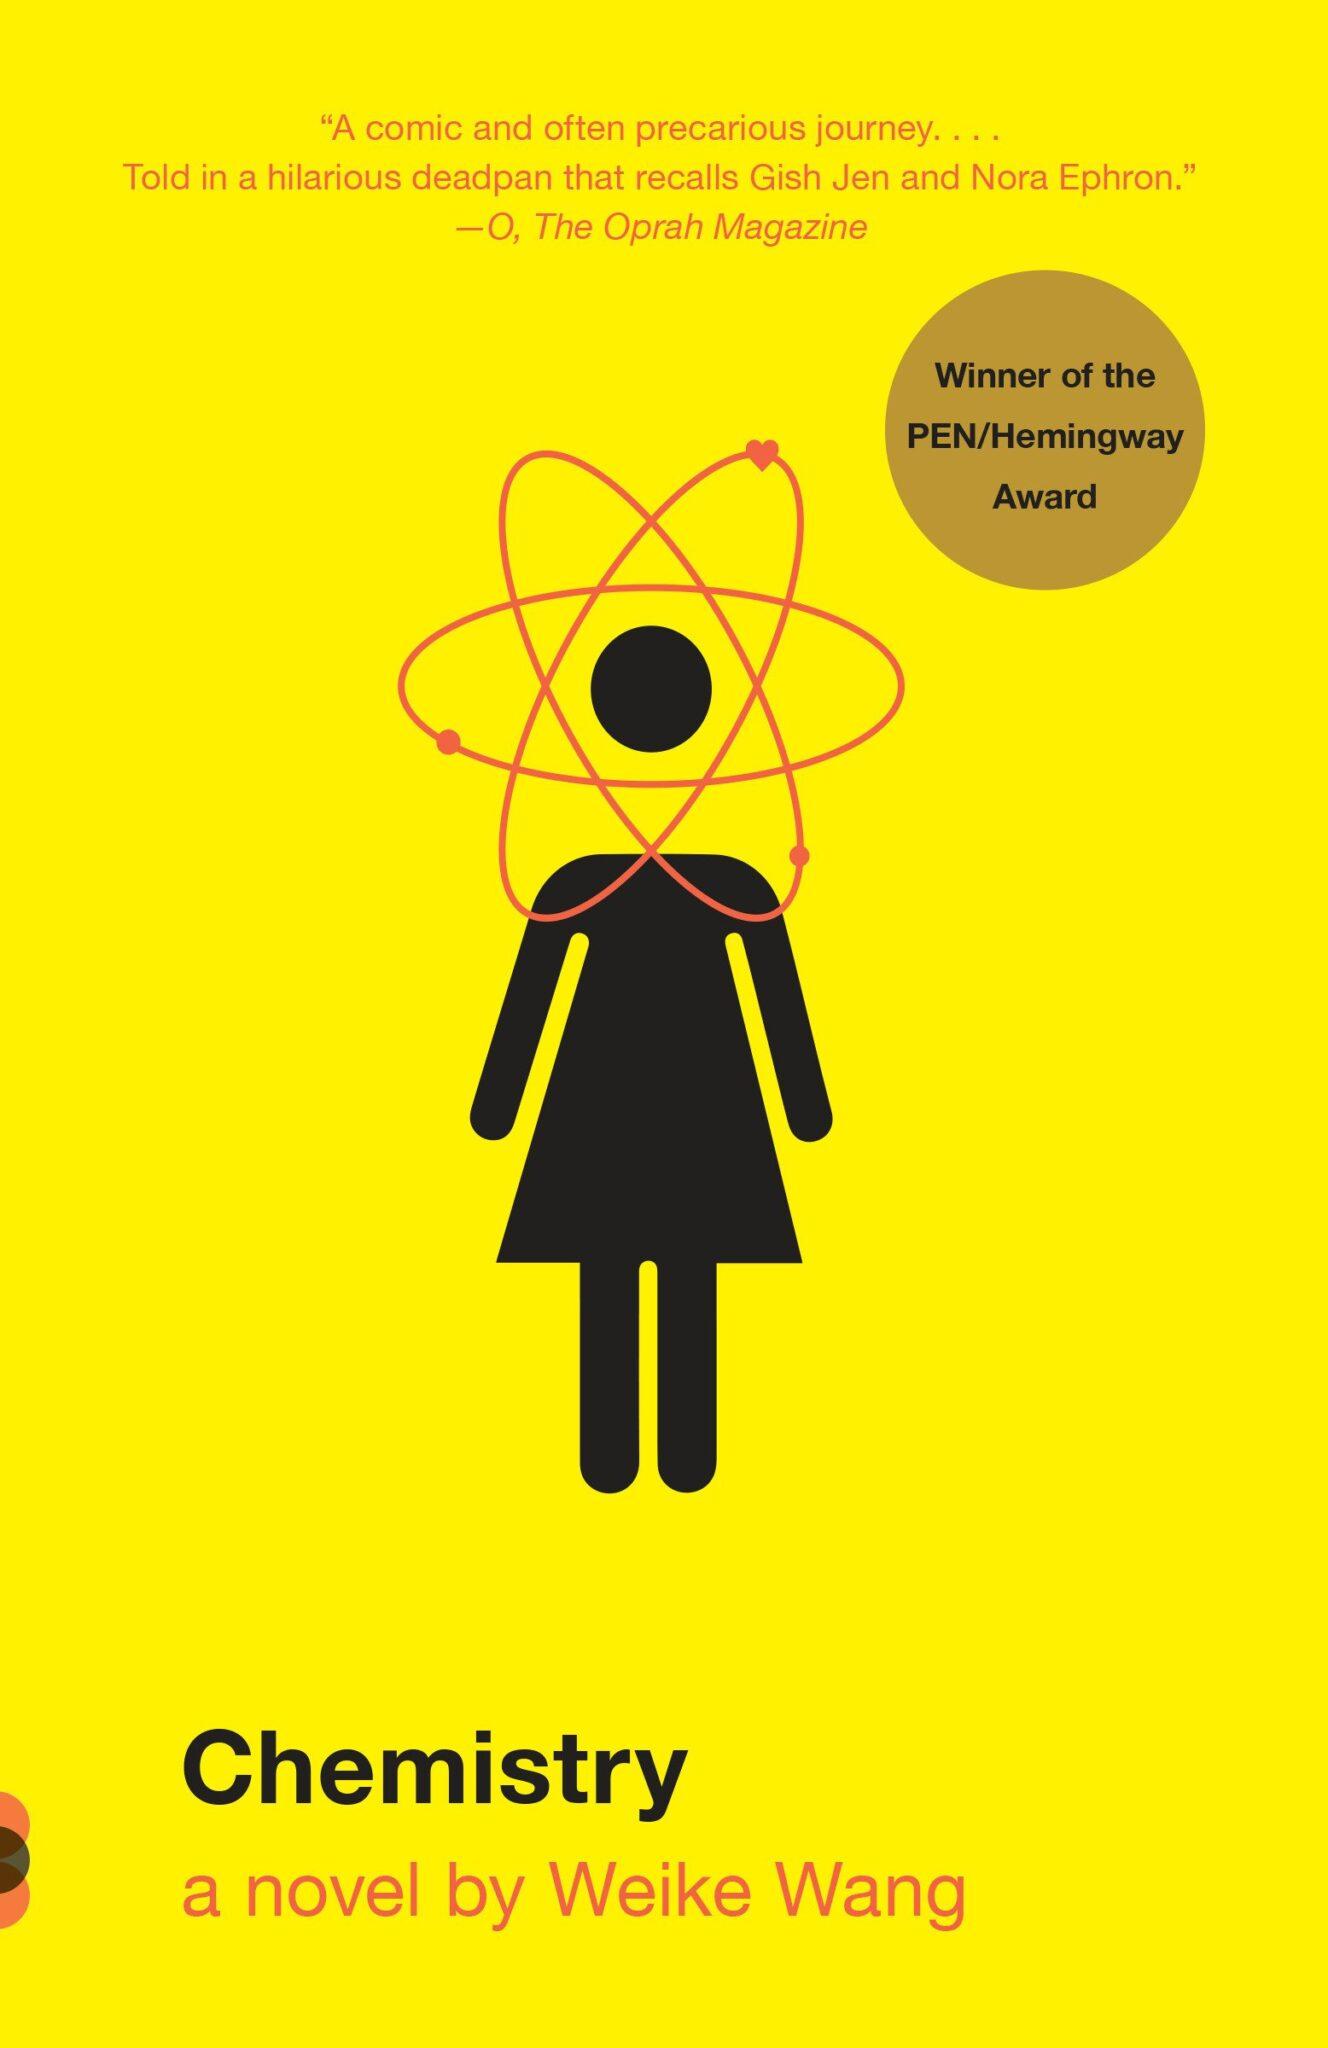 Chemistry Weike Wang